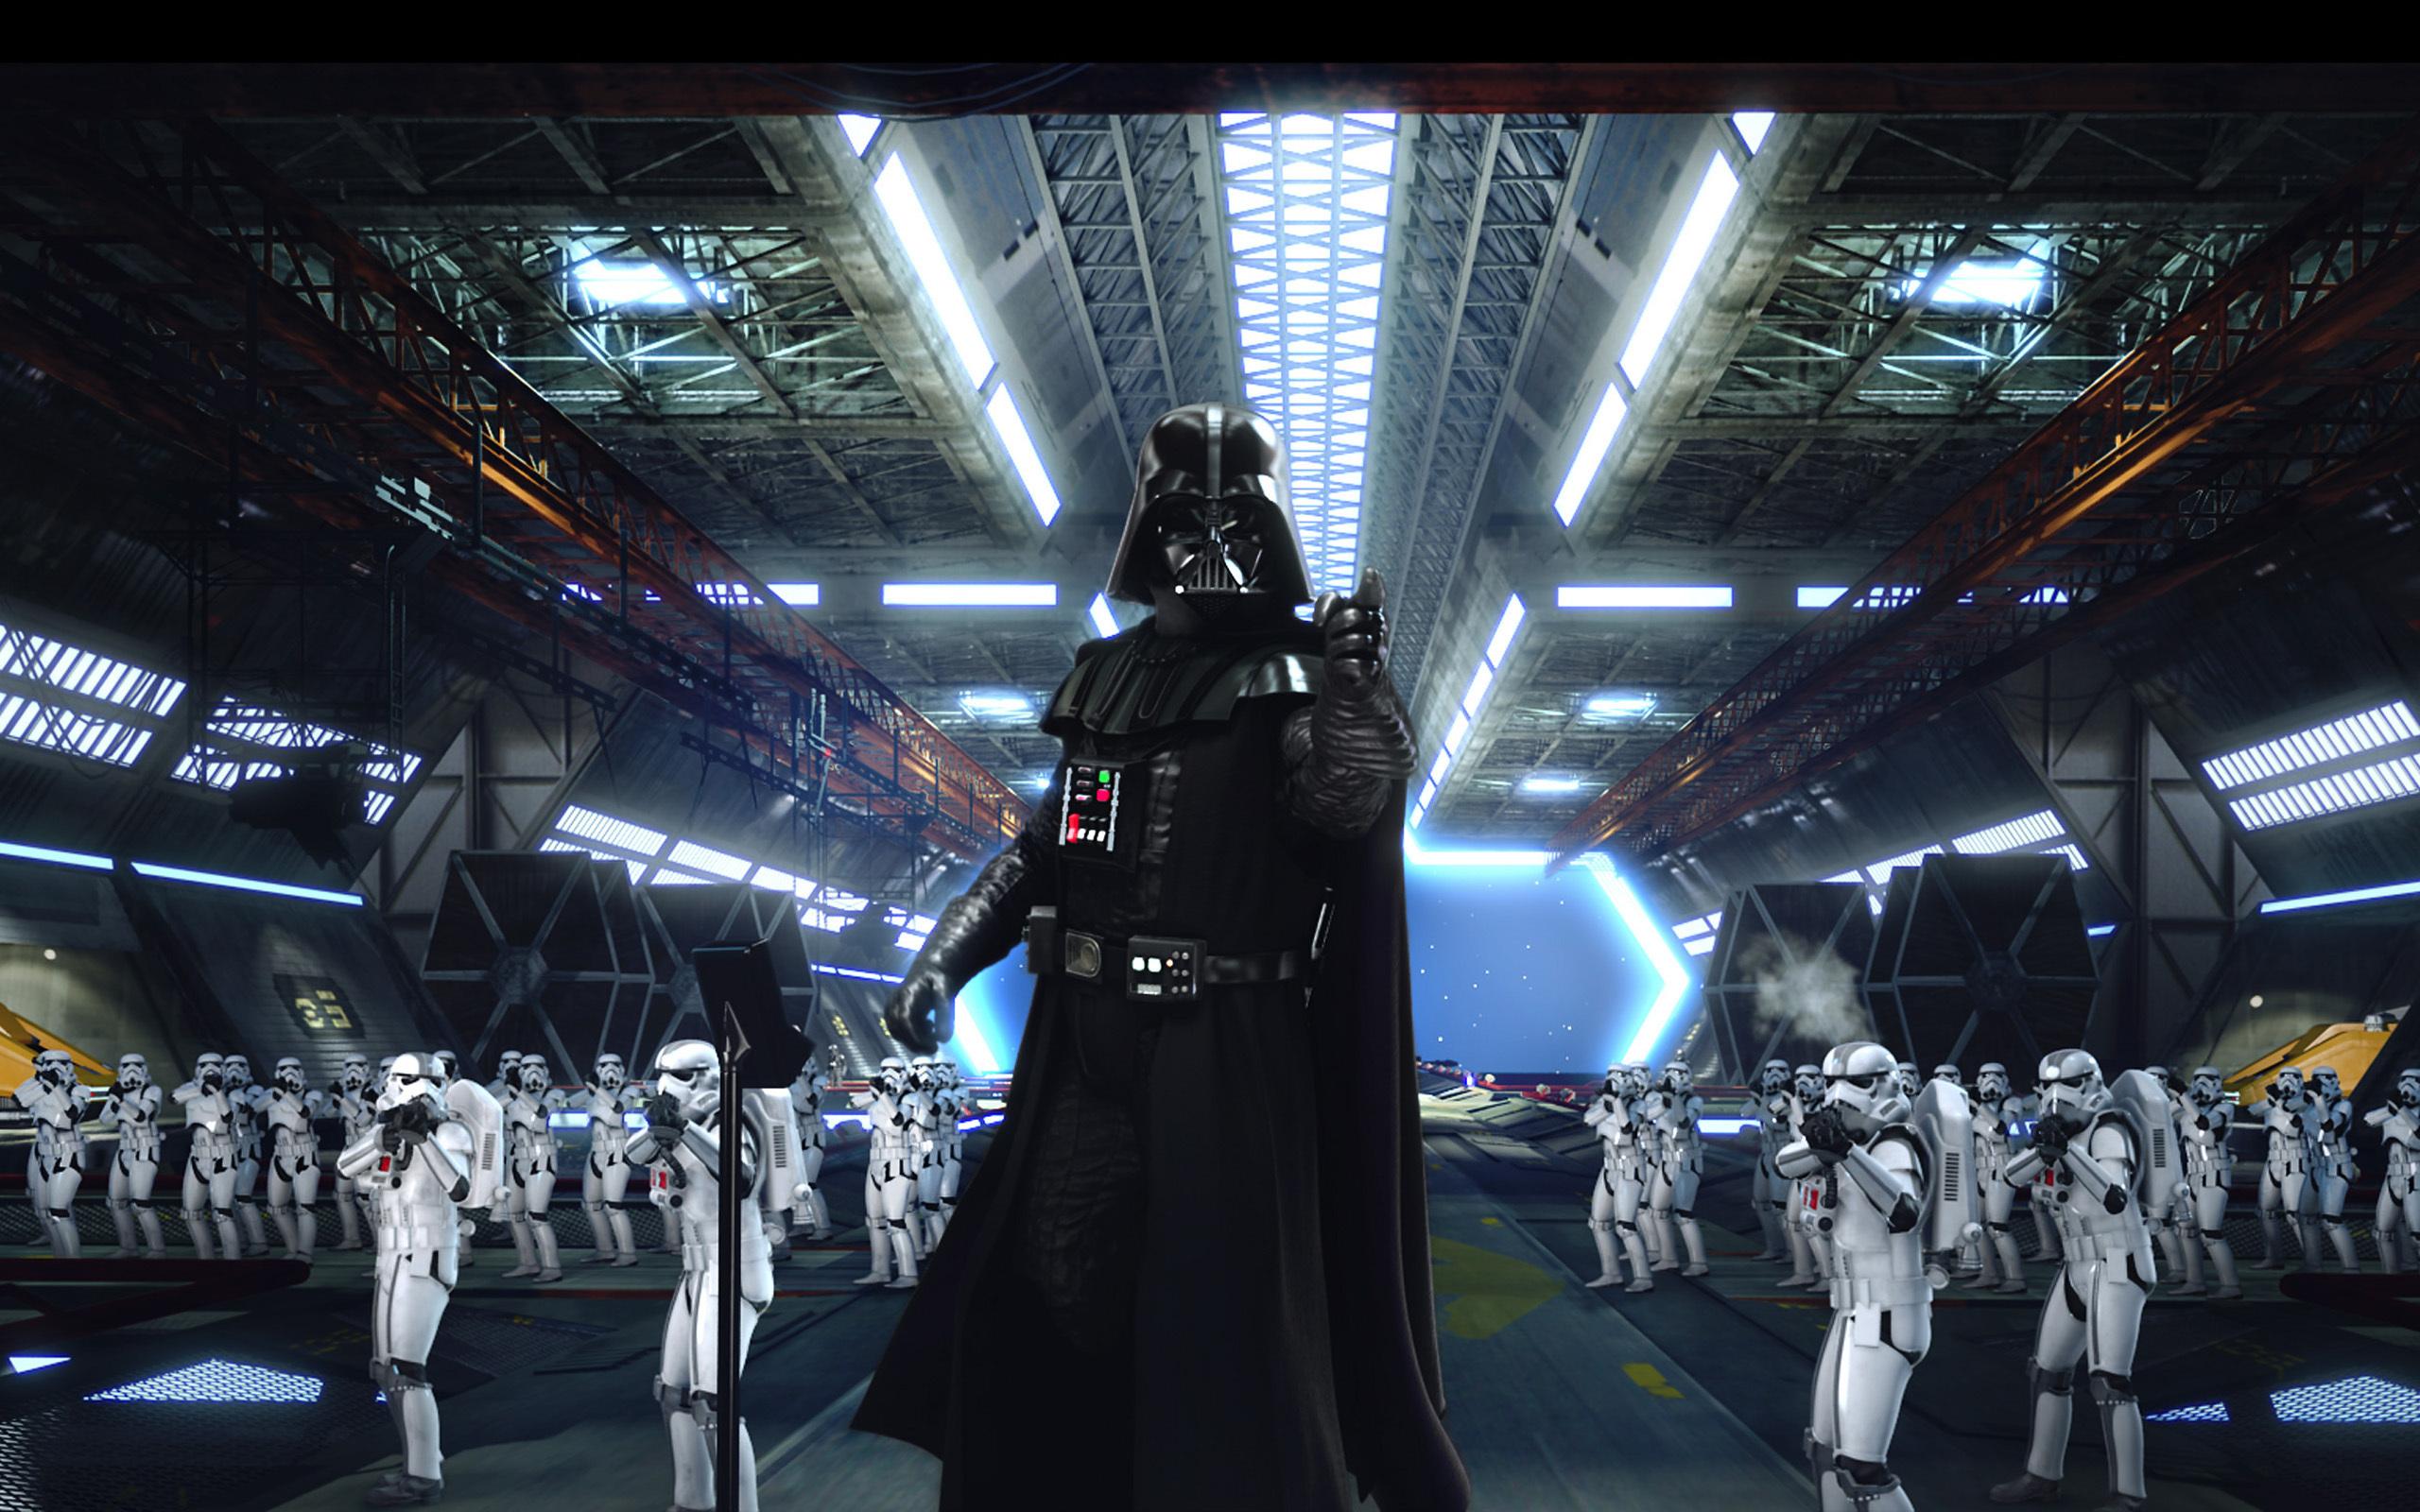 Free Download Star Wars Episode Ii Attack Of The Clones Wallpaper